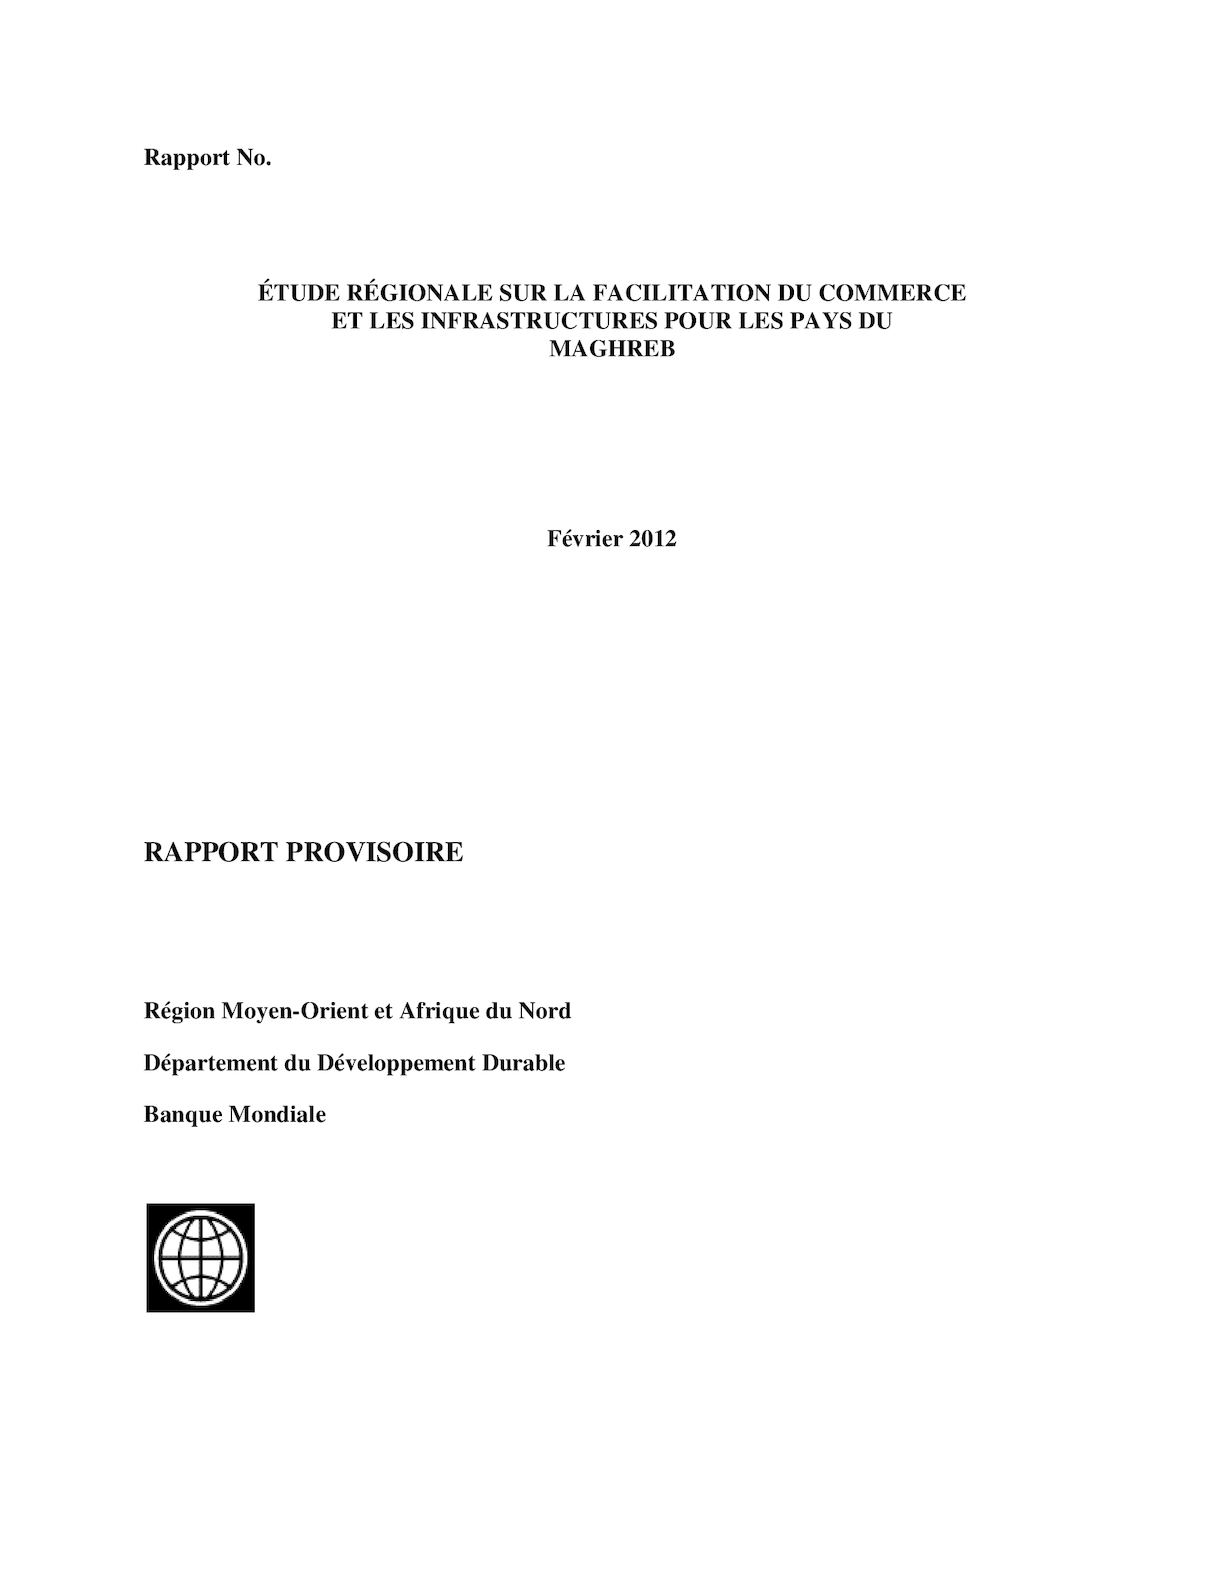 Rapport Maghreb Tfi Feb 12 2012ntrr